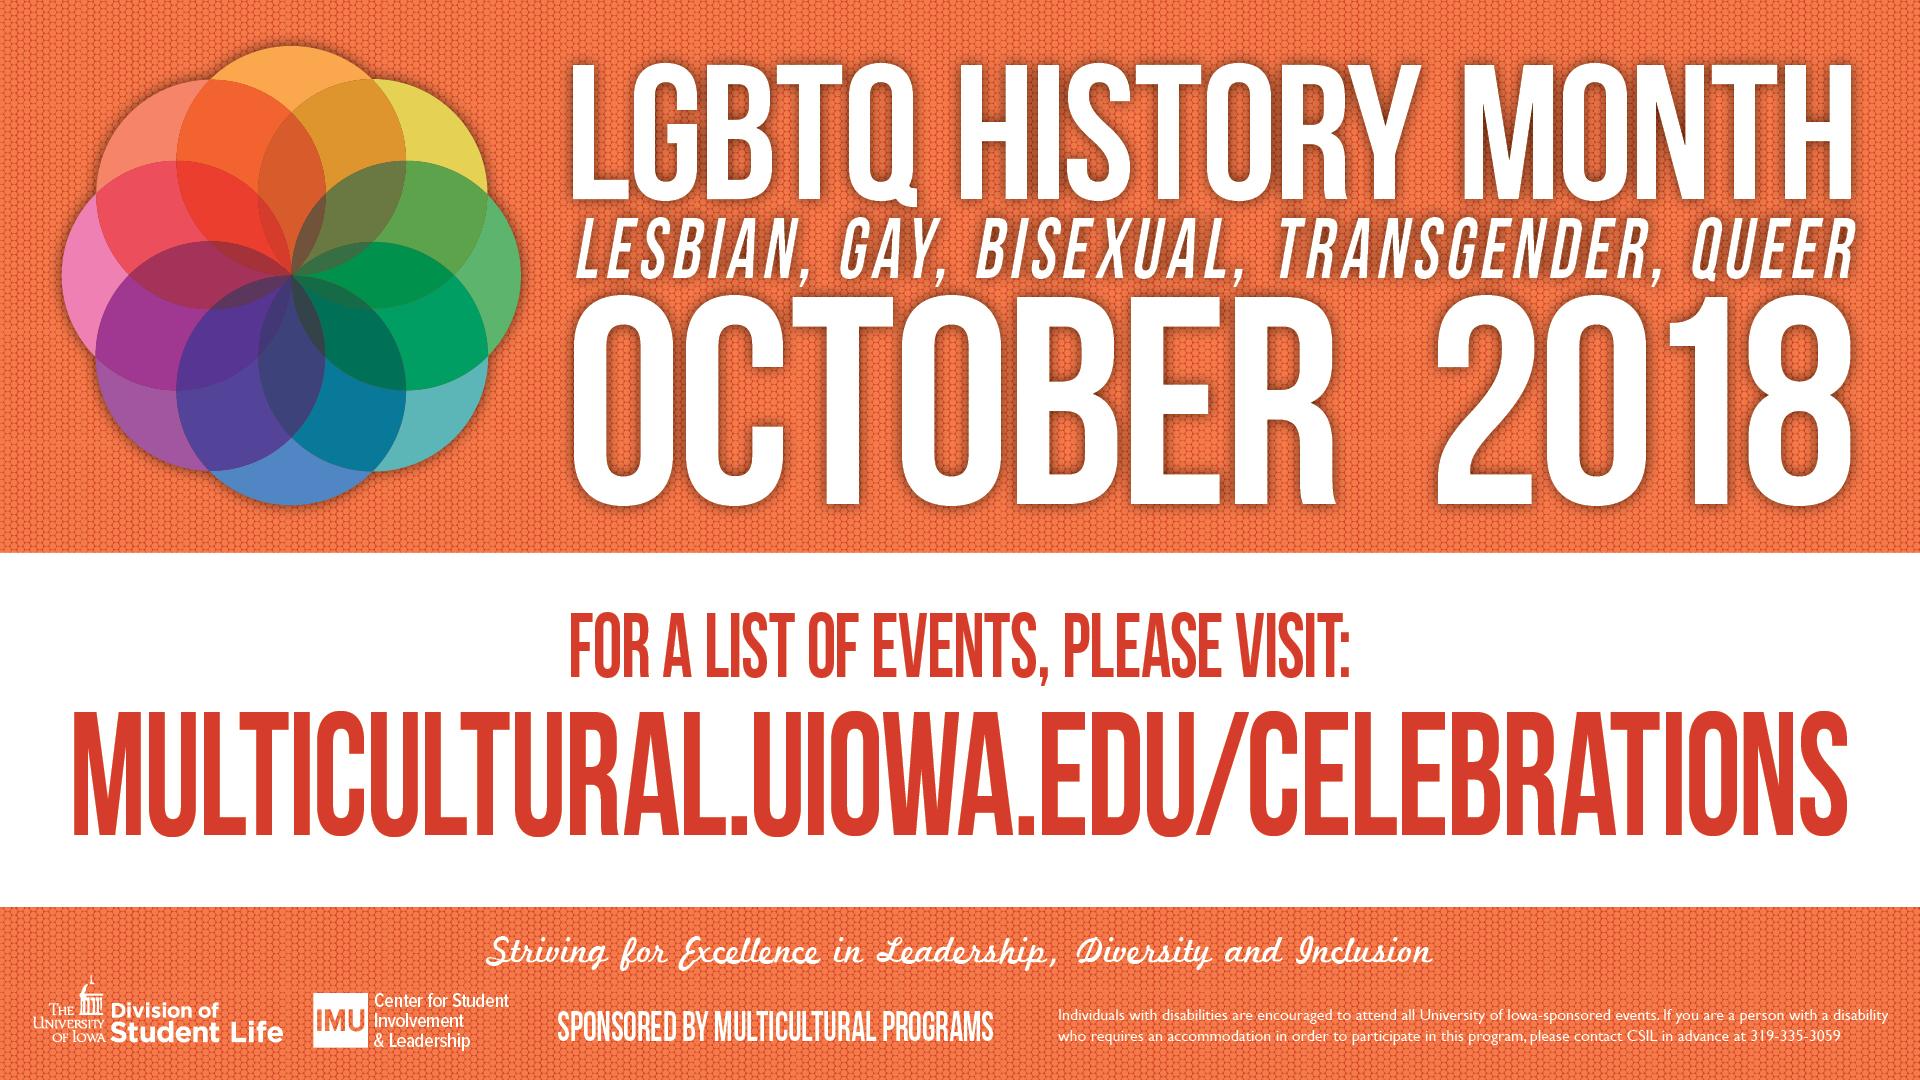 LGBTQ History Month